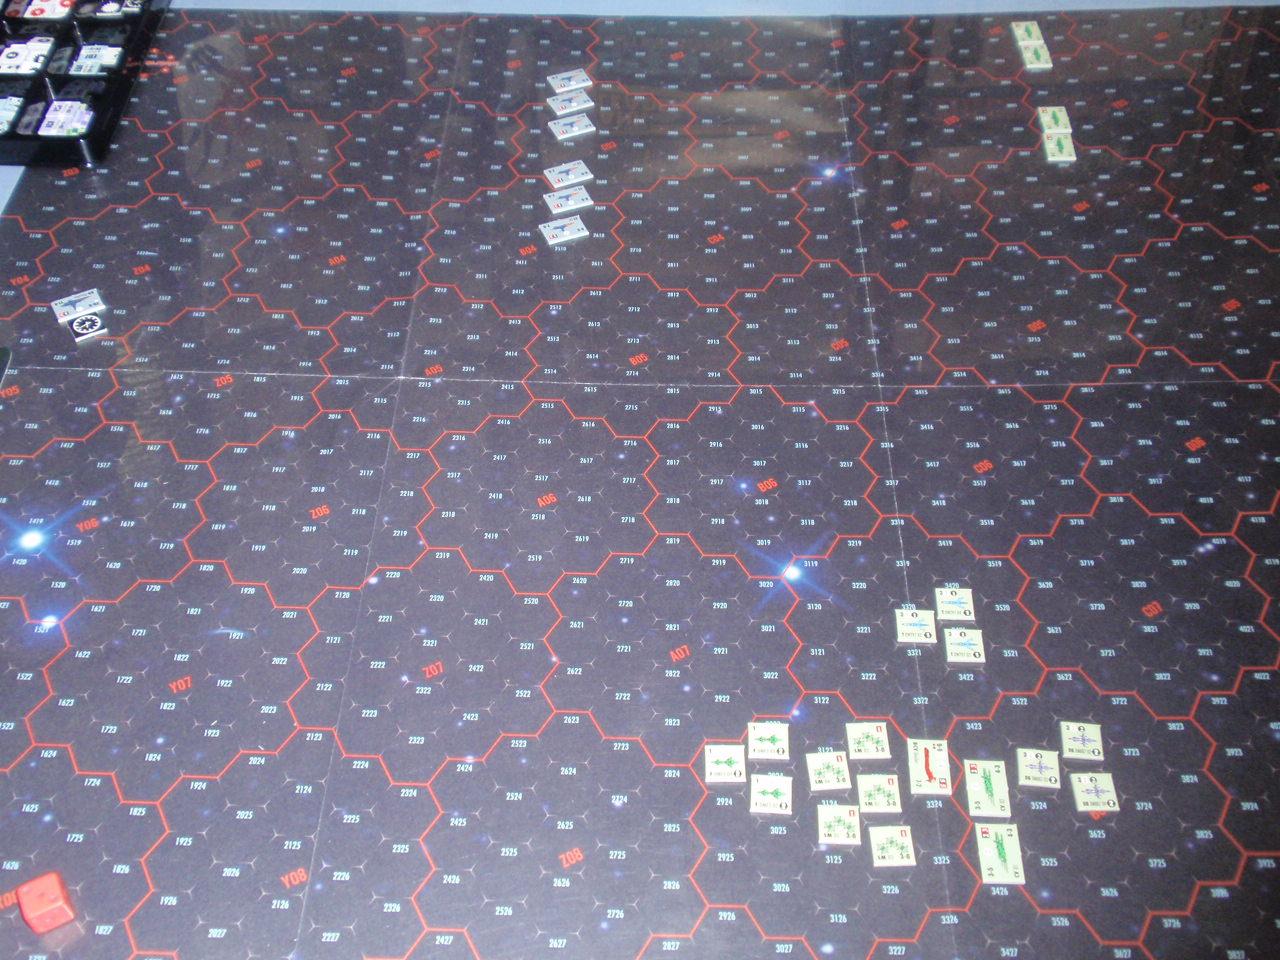 Bonsai Games「アイアン・デブリ・システム」よりシナリオ「マザータウン沖海戦」を再度ソロプレイ①_b0162202_19353586.jpg